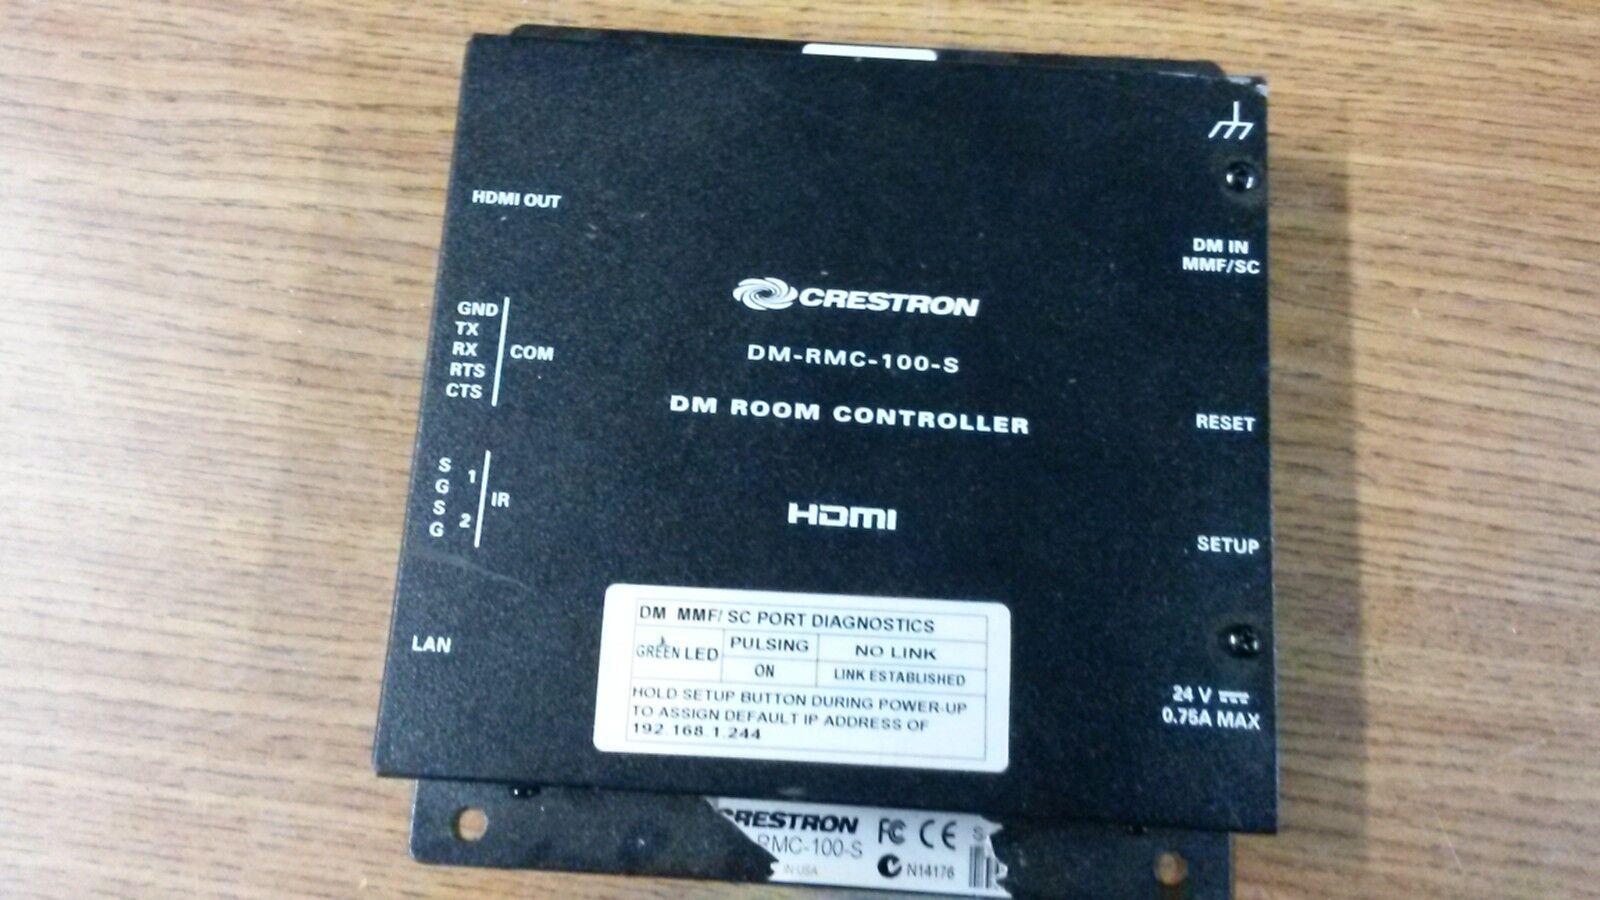 Crestron DM-RMC-100-S DigitalMedia 8G Fiber Receiver Room Controller w/ Charger